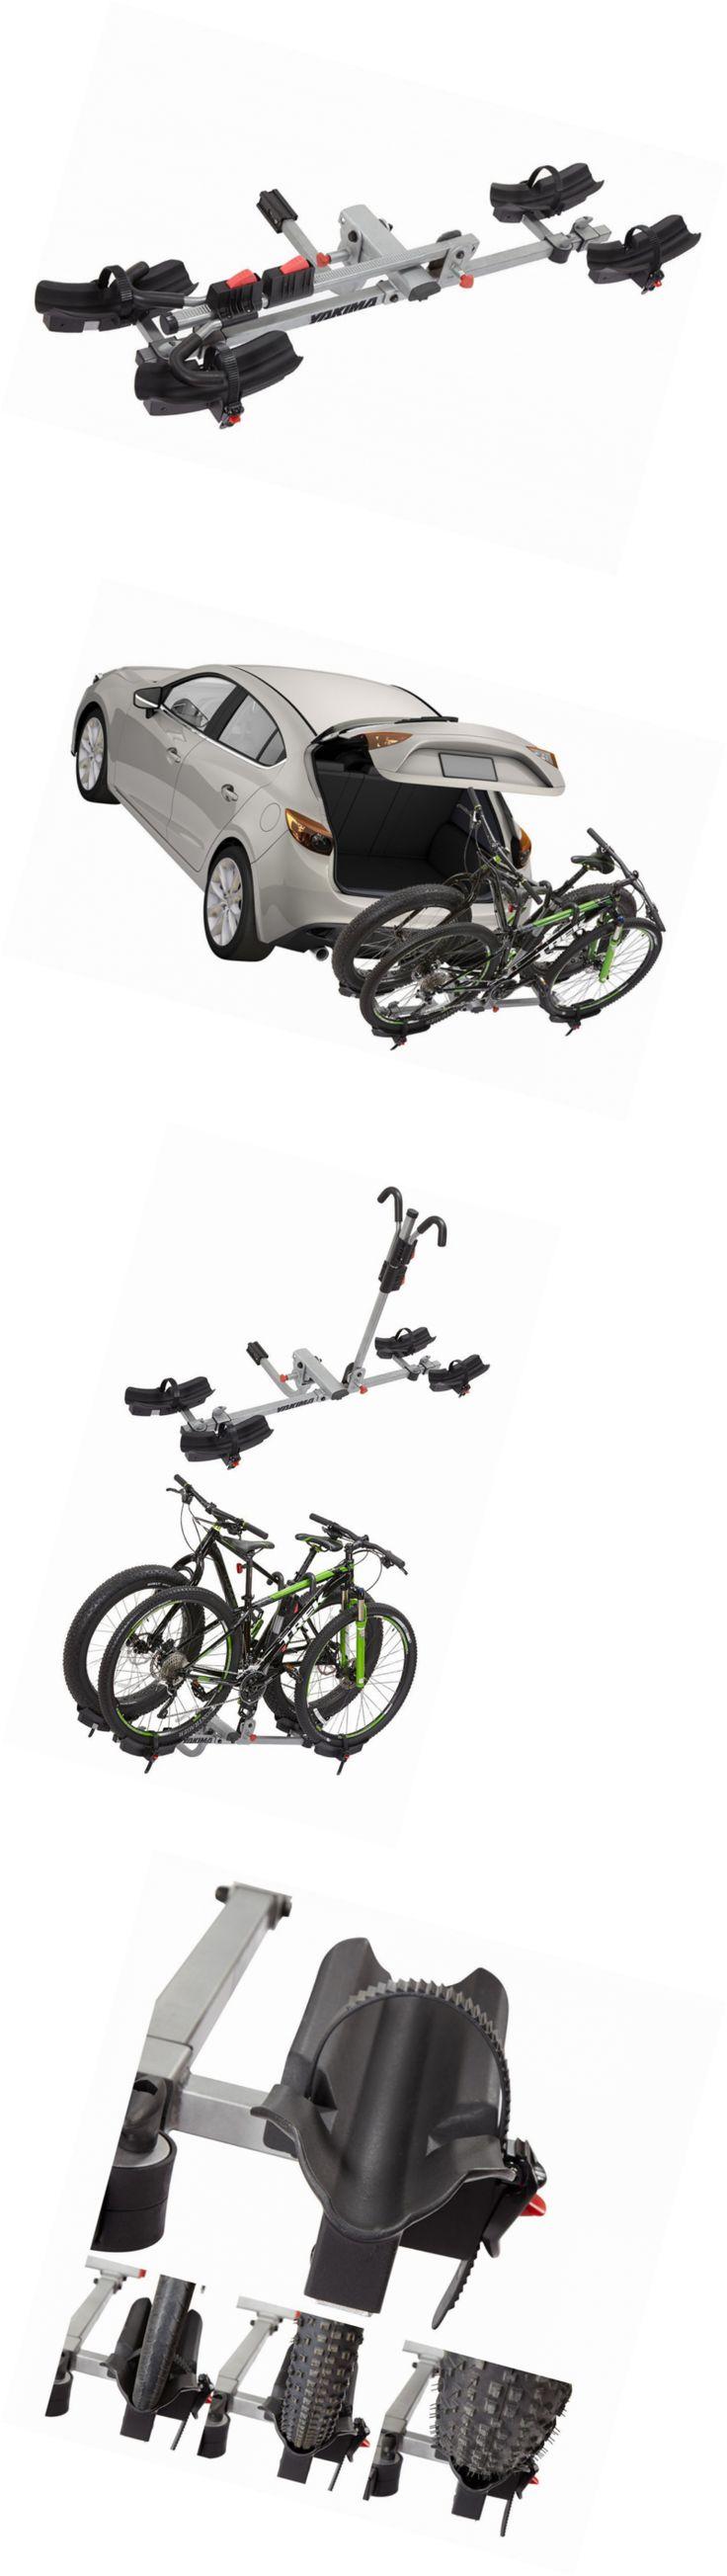 Car and Truck Racks 177849: Yakima Twotimer Hitch Bike Rack -> BUY IT NOW ONLY: $277.18 on eBay!